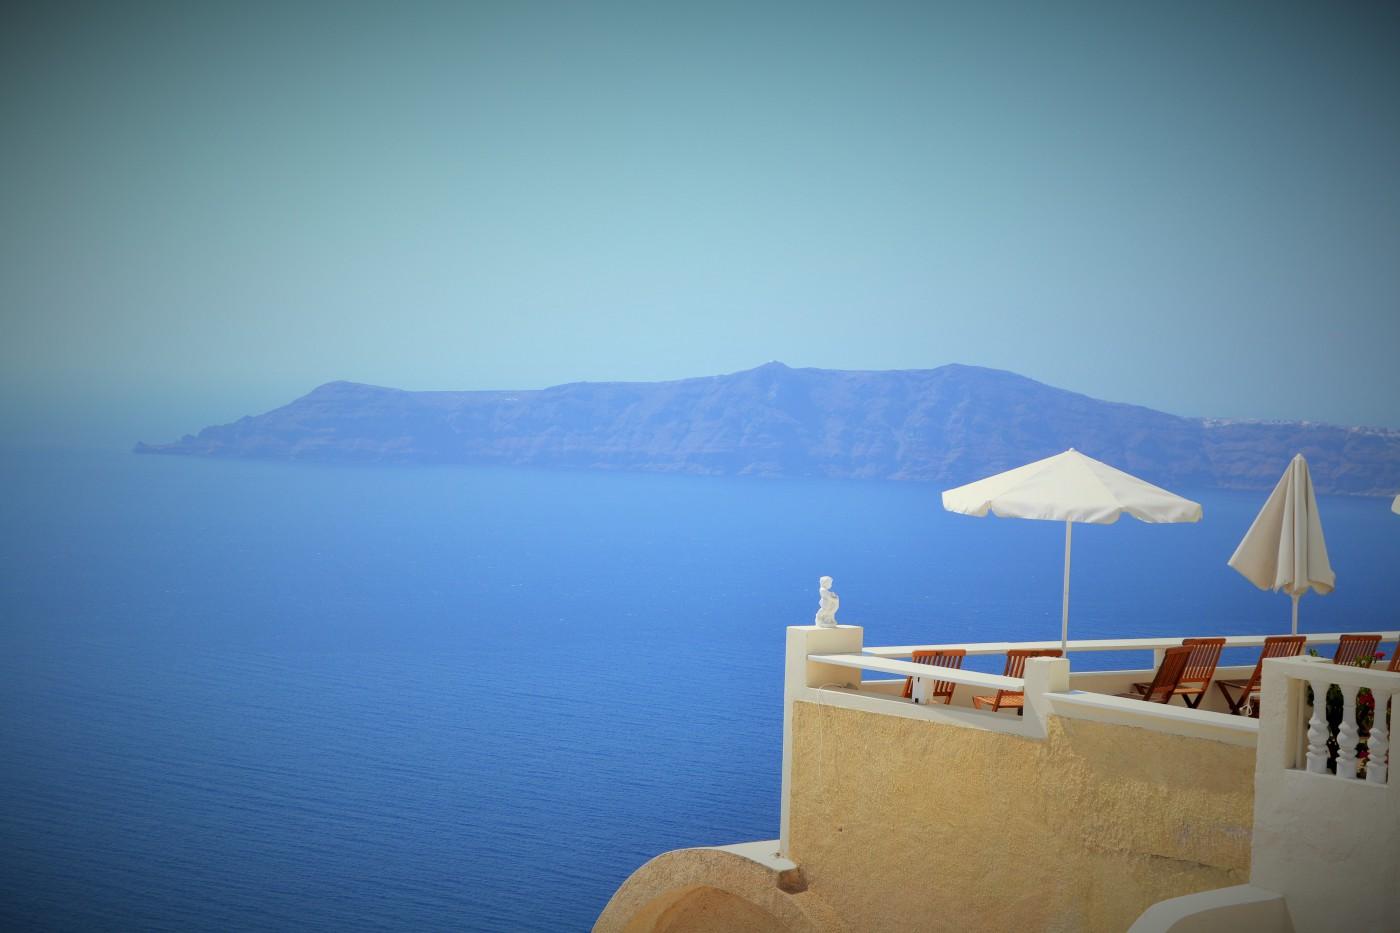 Santorini Caldera Copyright S. Schaeffer